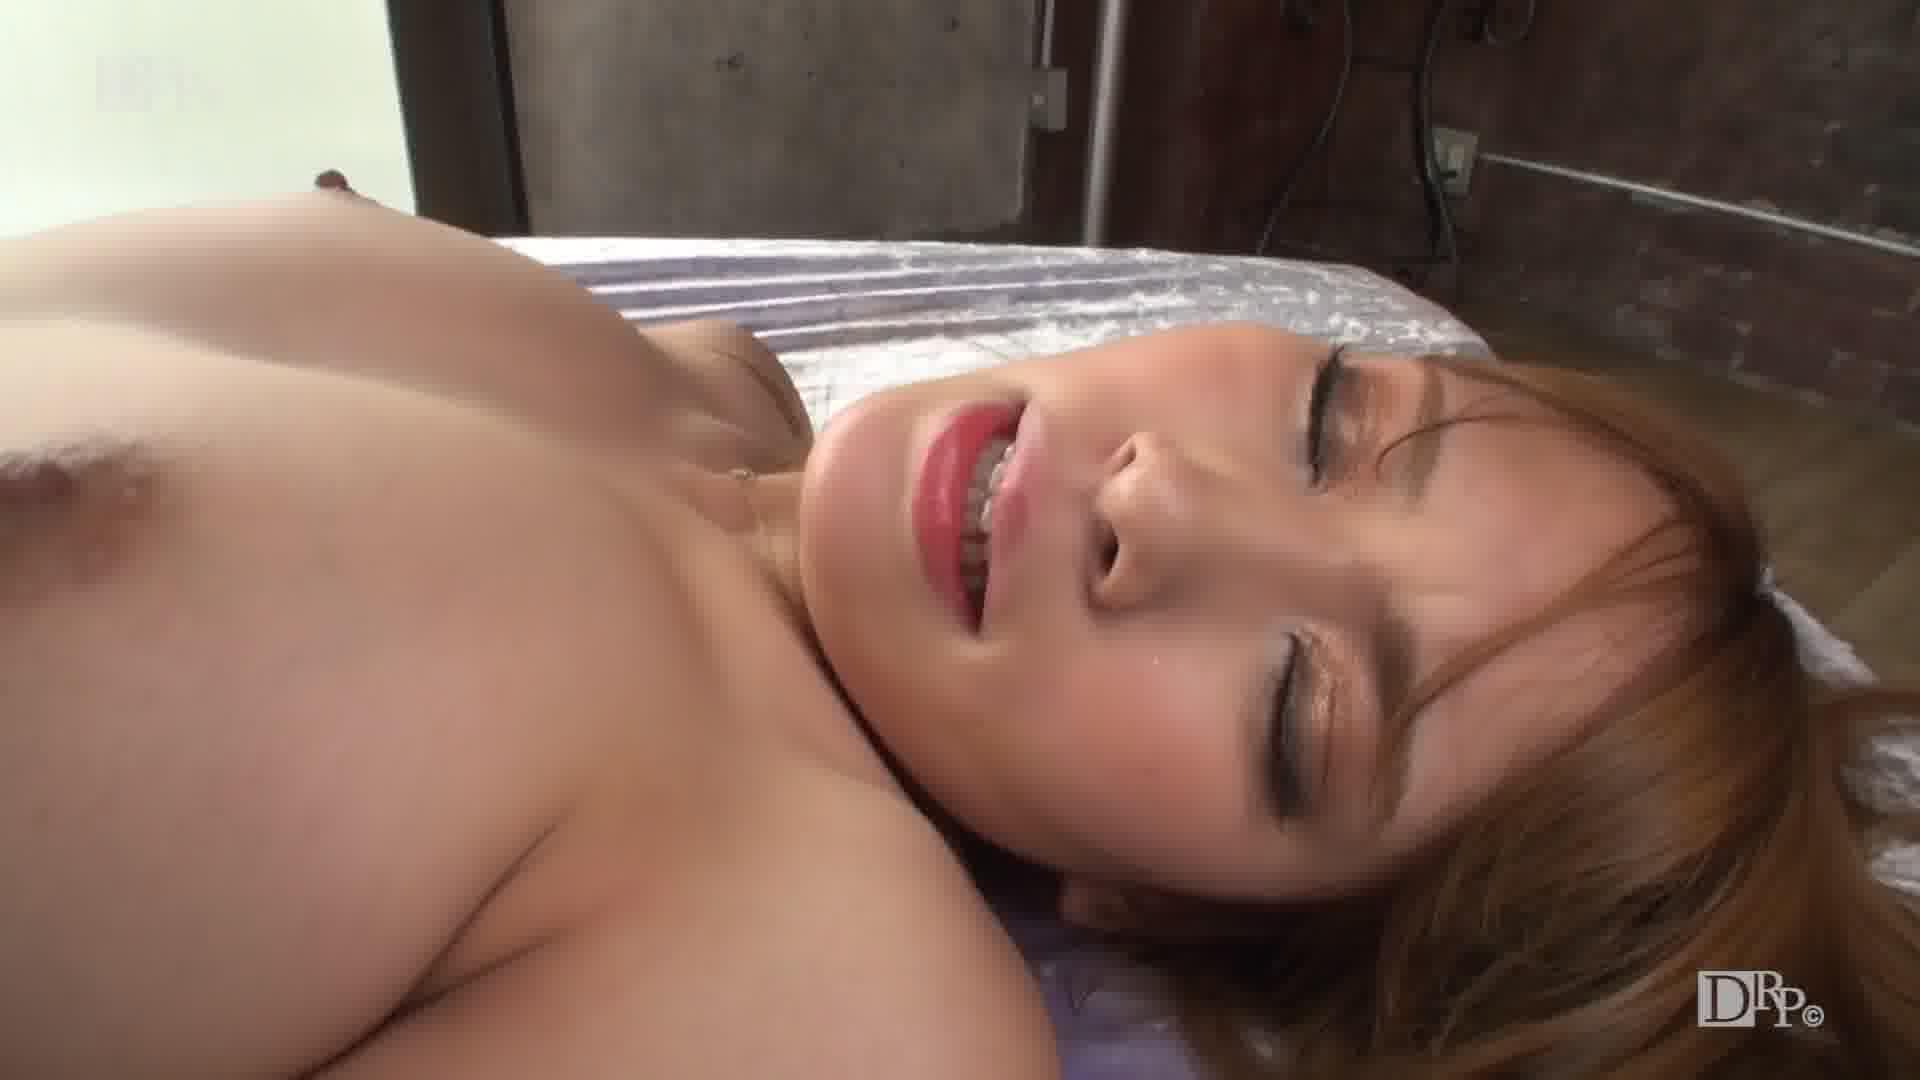 Gカップアンソロジー - 大塚咲【巨乳・パイズリ・ベスト】